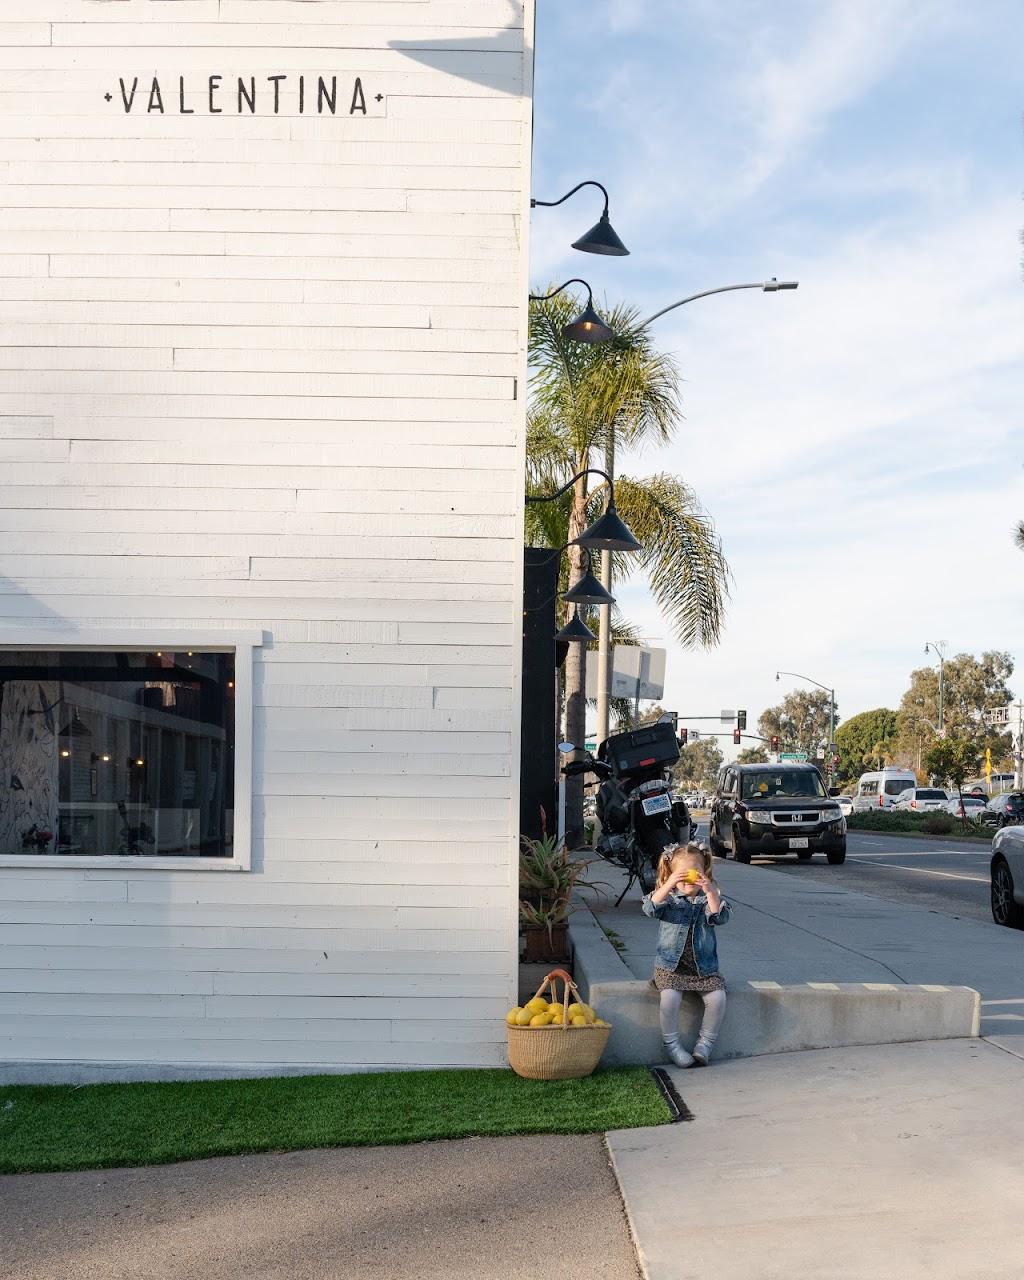 Valentina Restaurant - restaurant  | Photo 7 of 10 | Address: 810 N Coast Hwy 101, Encinitas, CA 92024, USA | Phone: (760) 943-6686